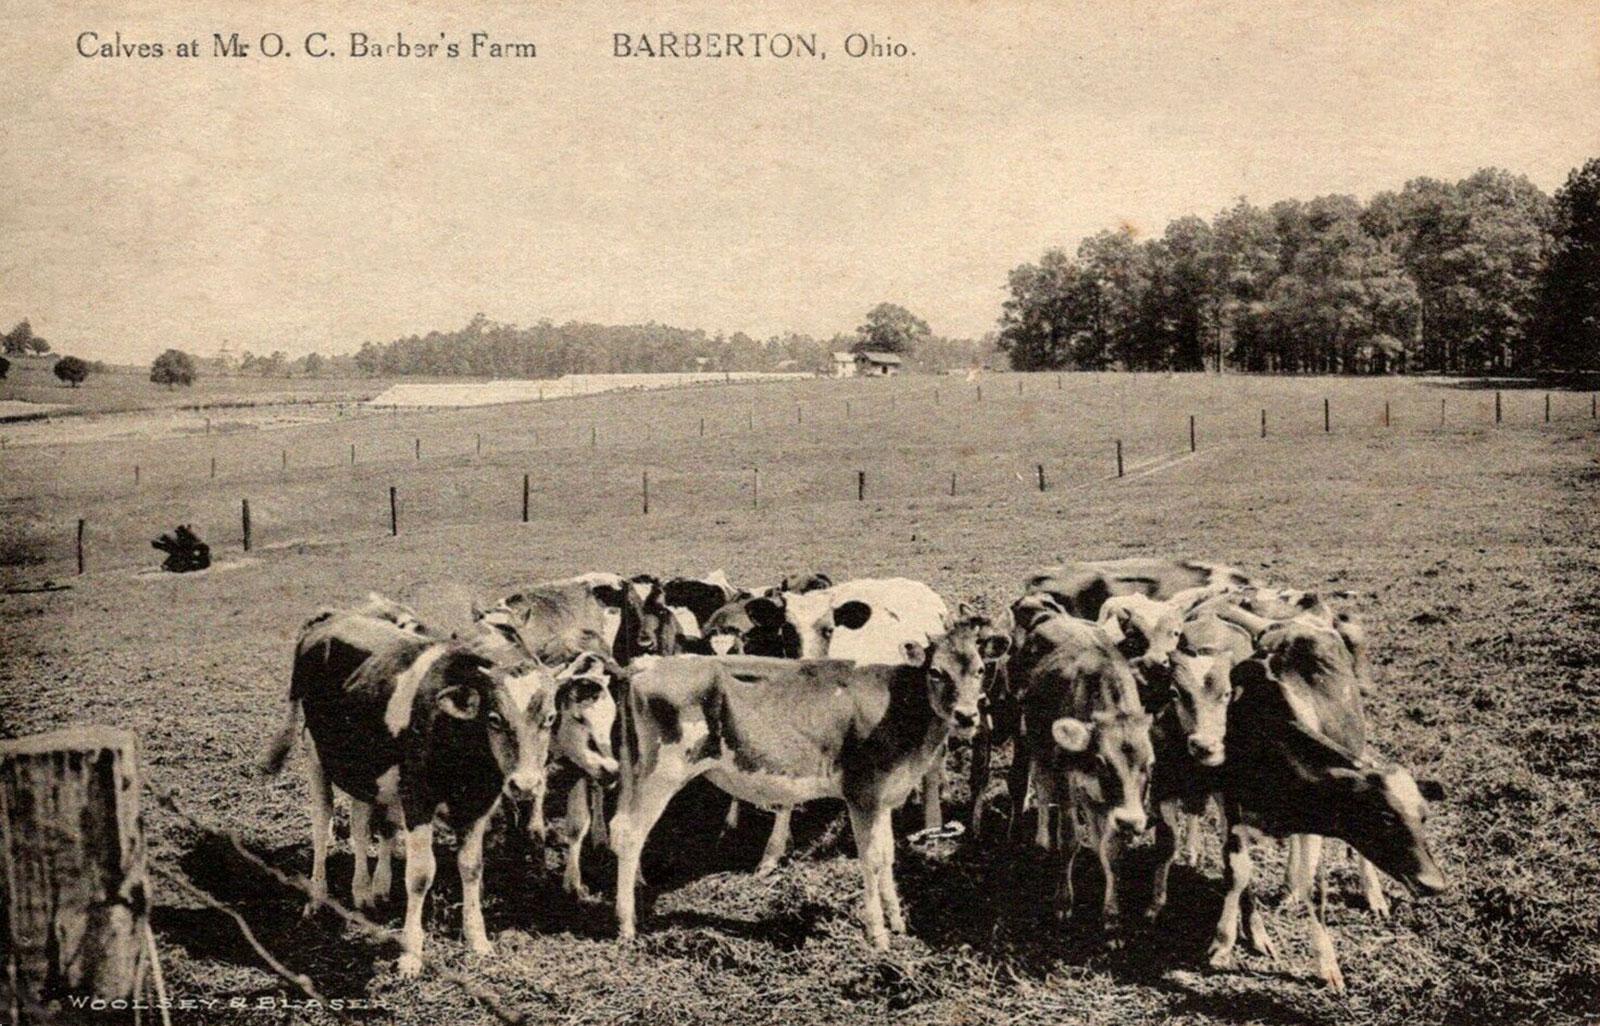 barberton-barber-farm-2